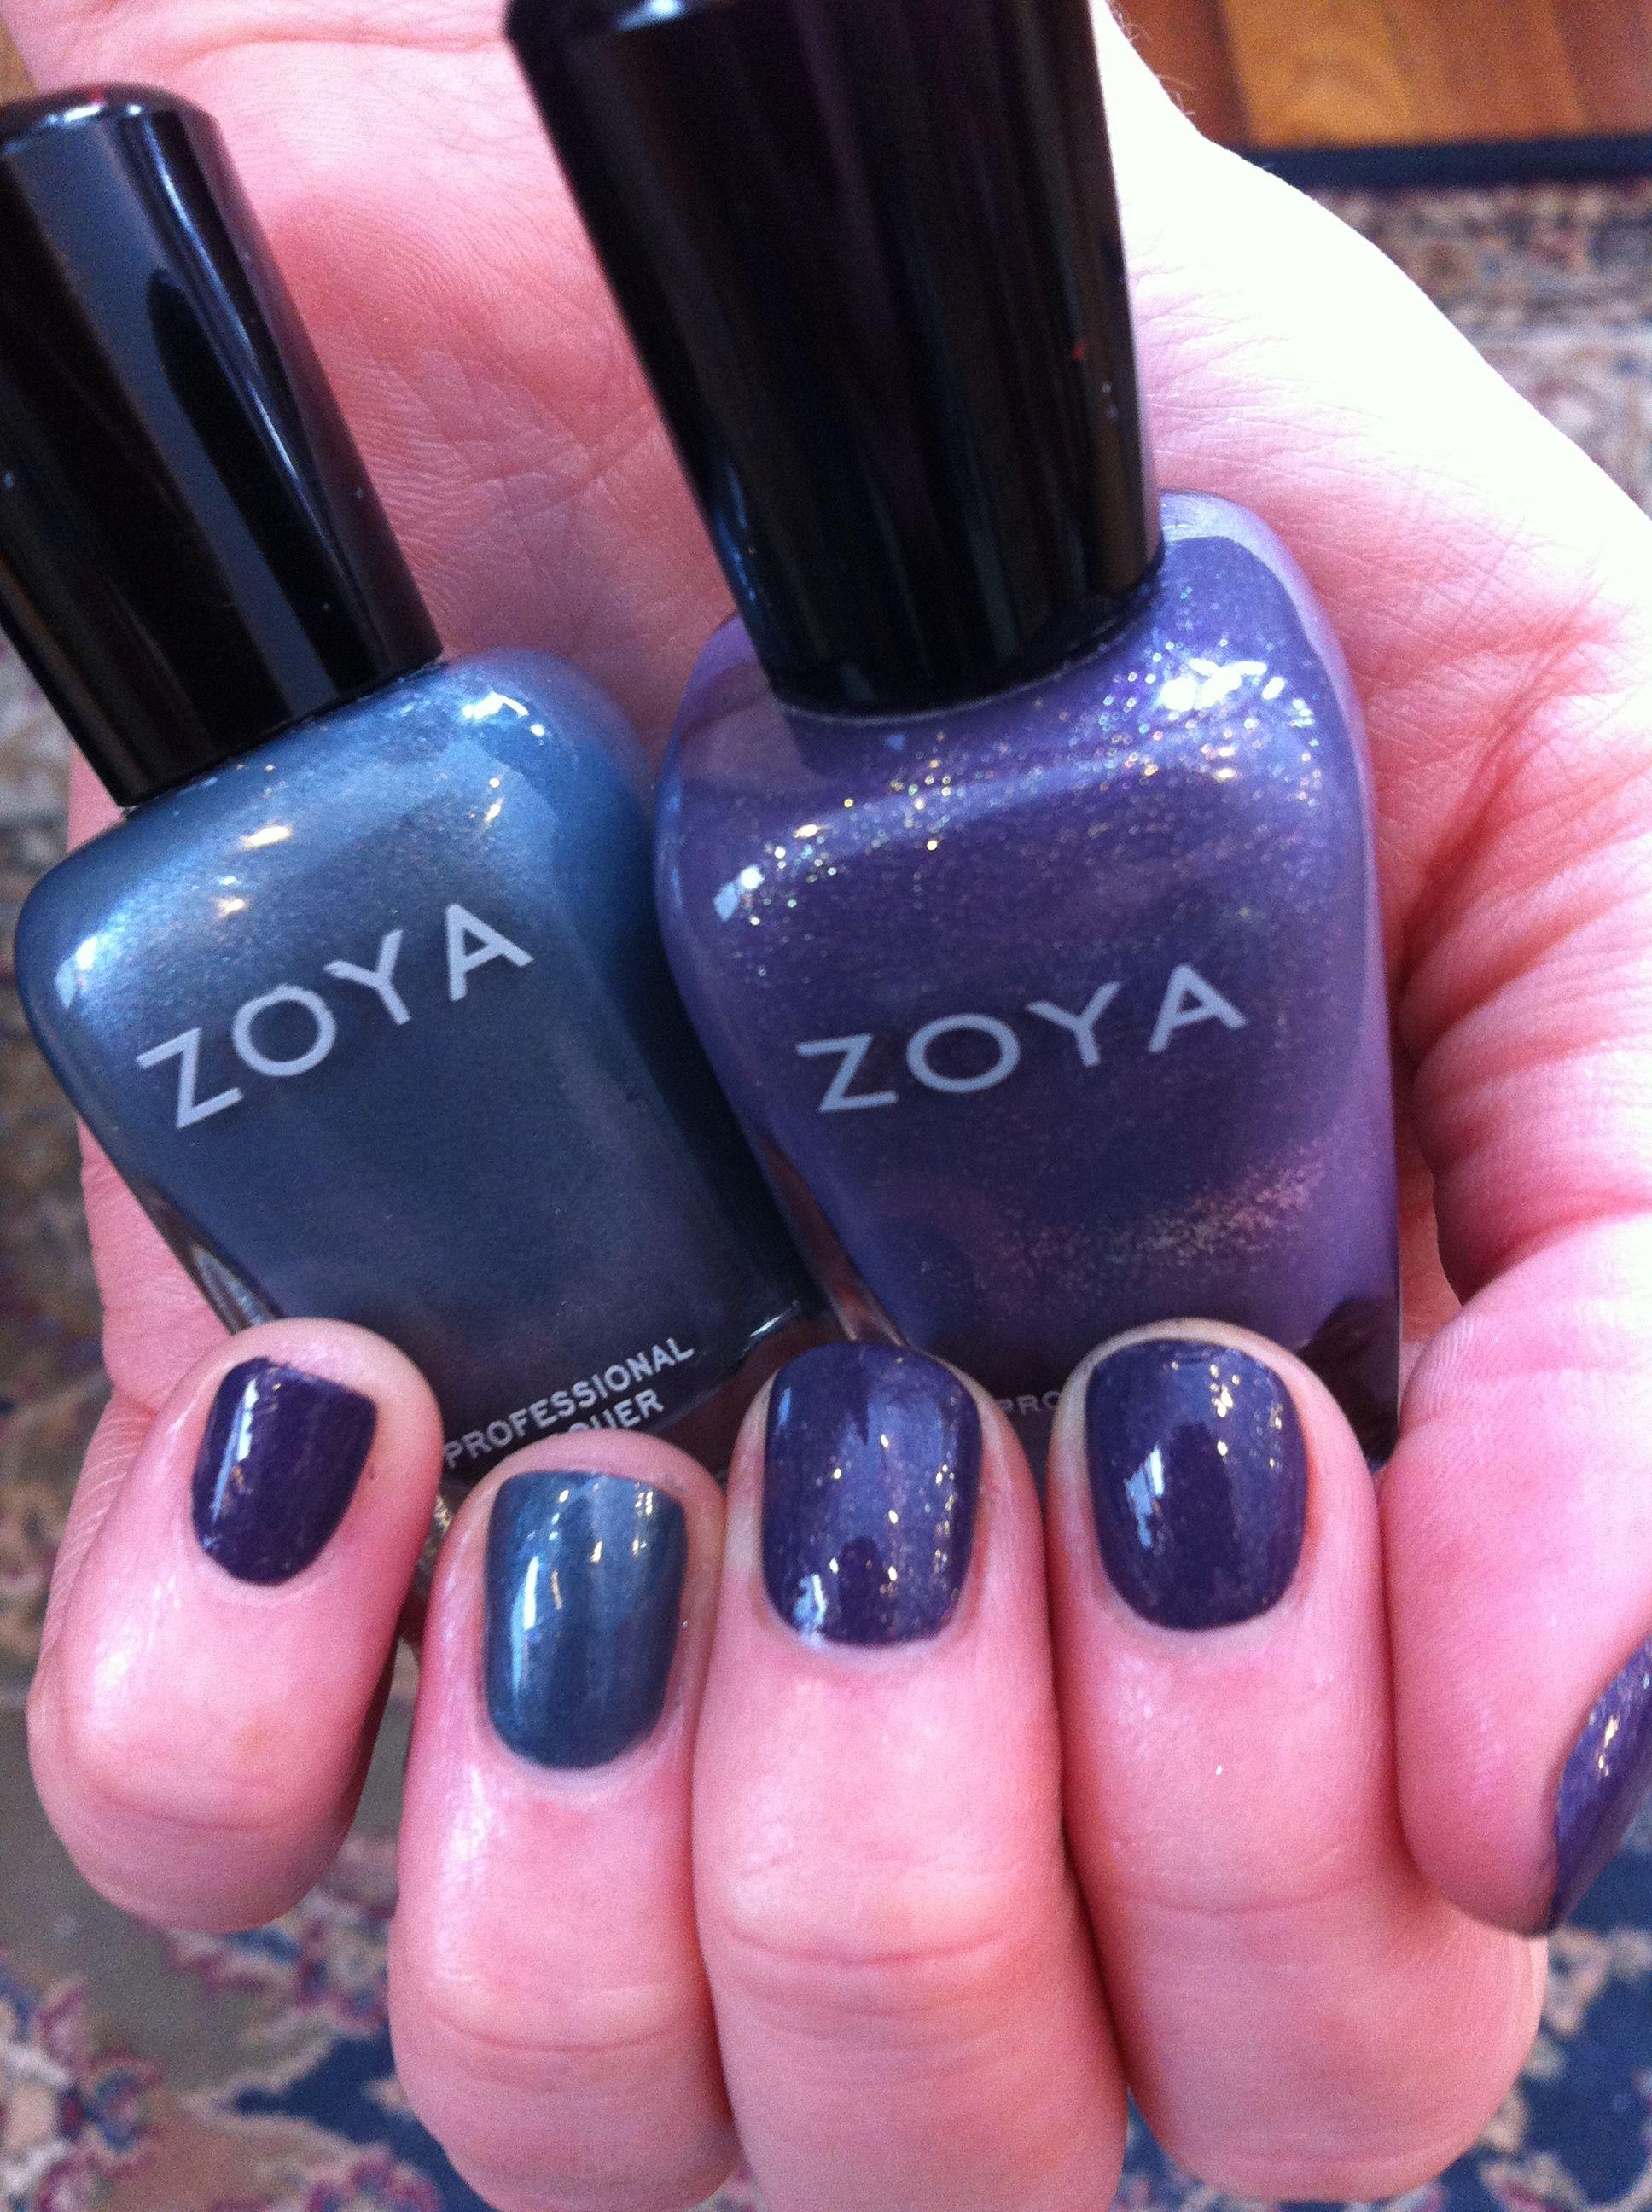 Zoya's Marina and Neeka